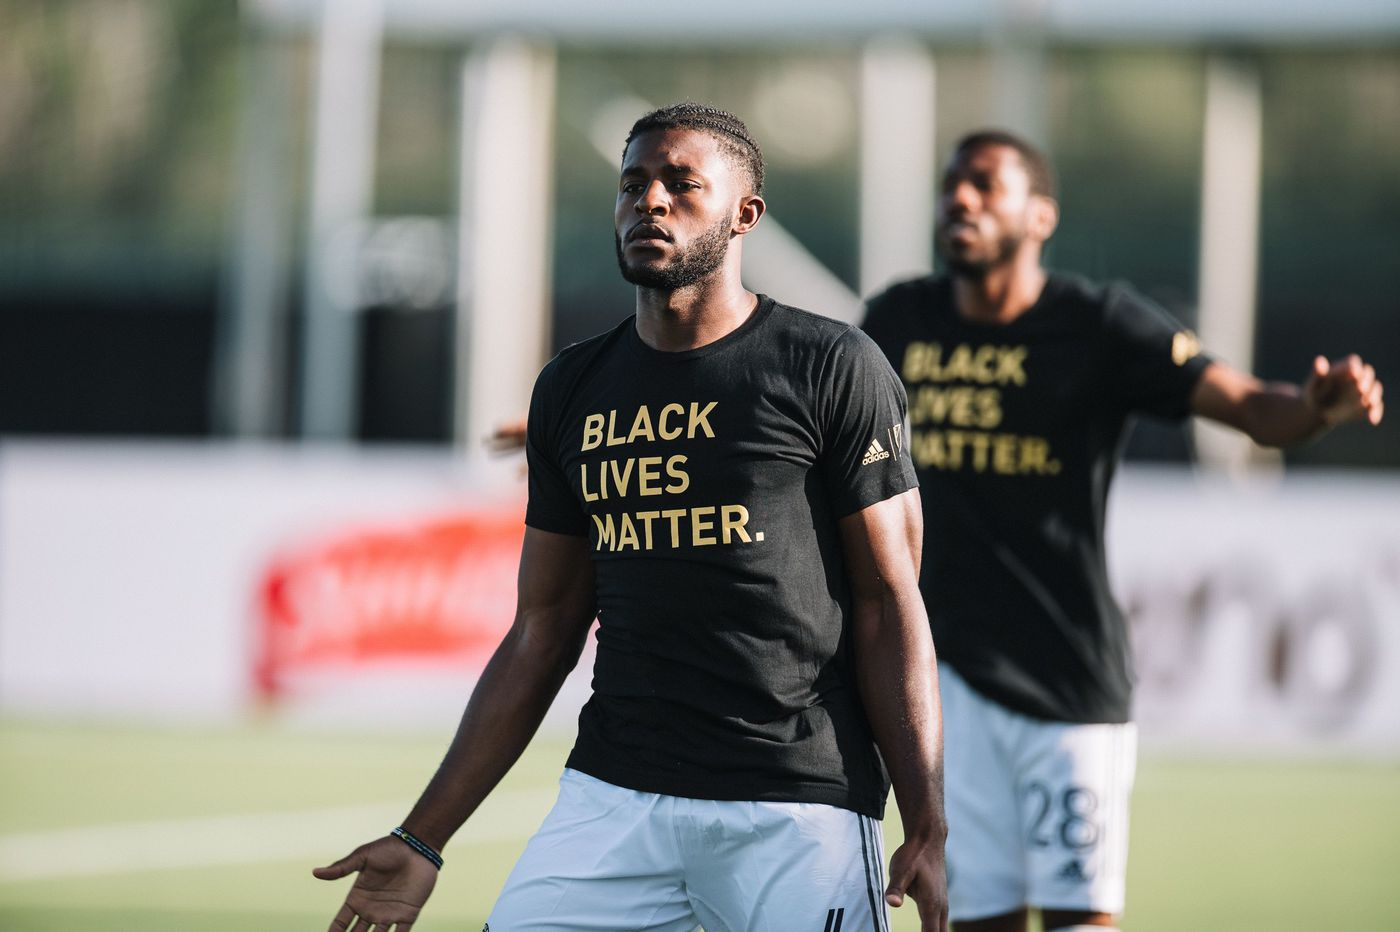 Union's Mark McKenzie backs Reggie Cannon's kneeling protest with FC Dallas